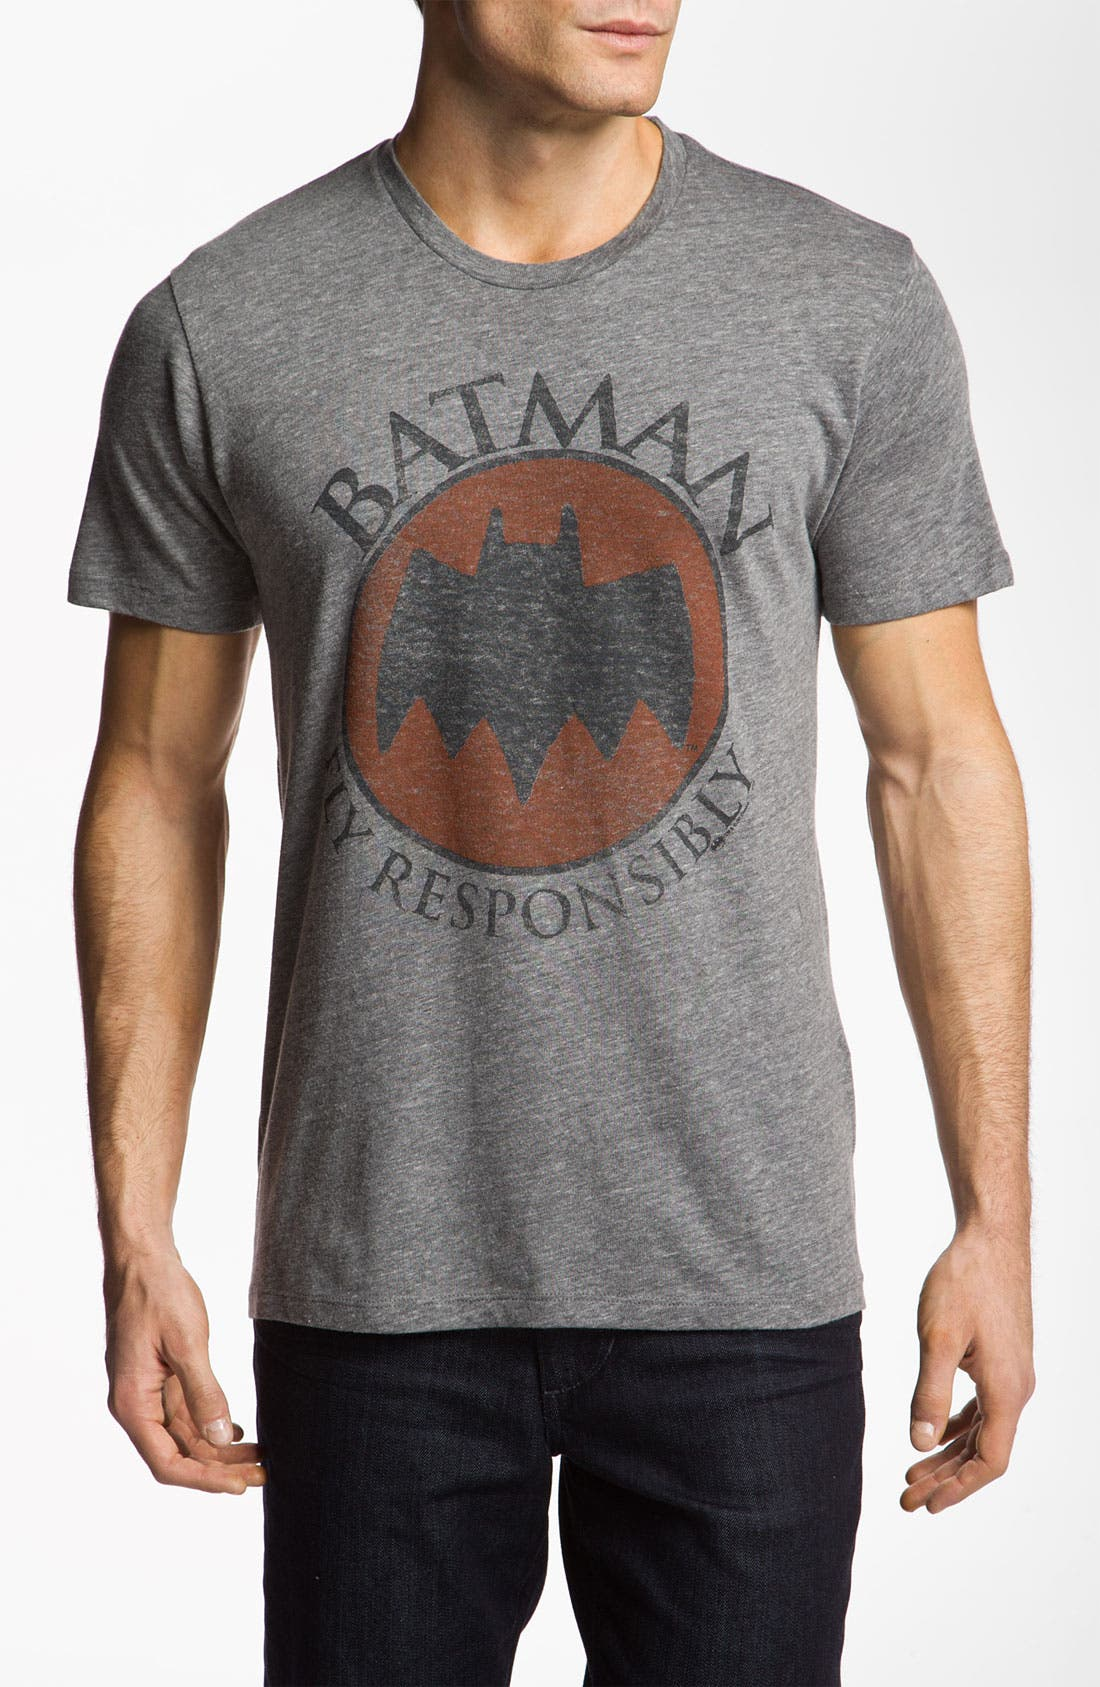 Alternate Image 1 Selected - Junk Food 'Batman - Fly Responsibly' T-Shirt